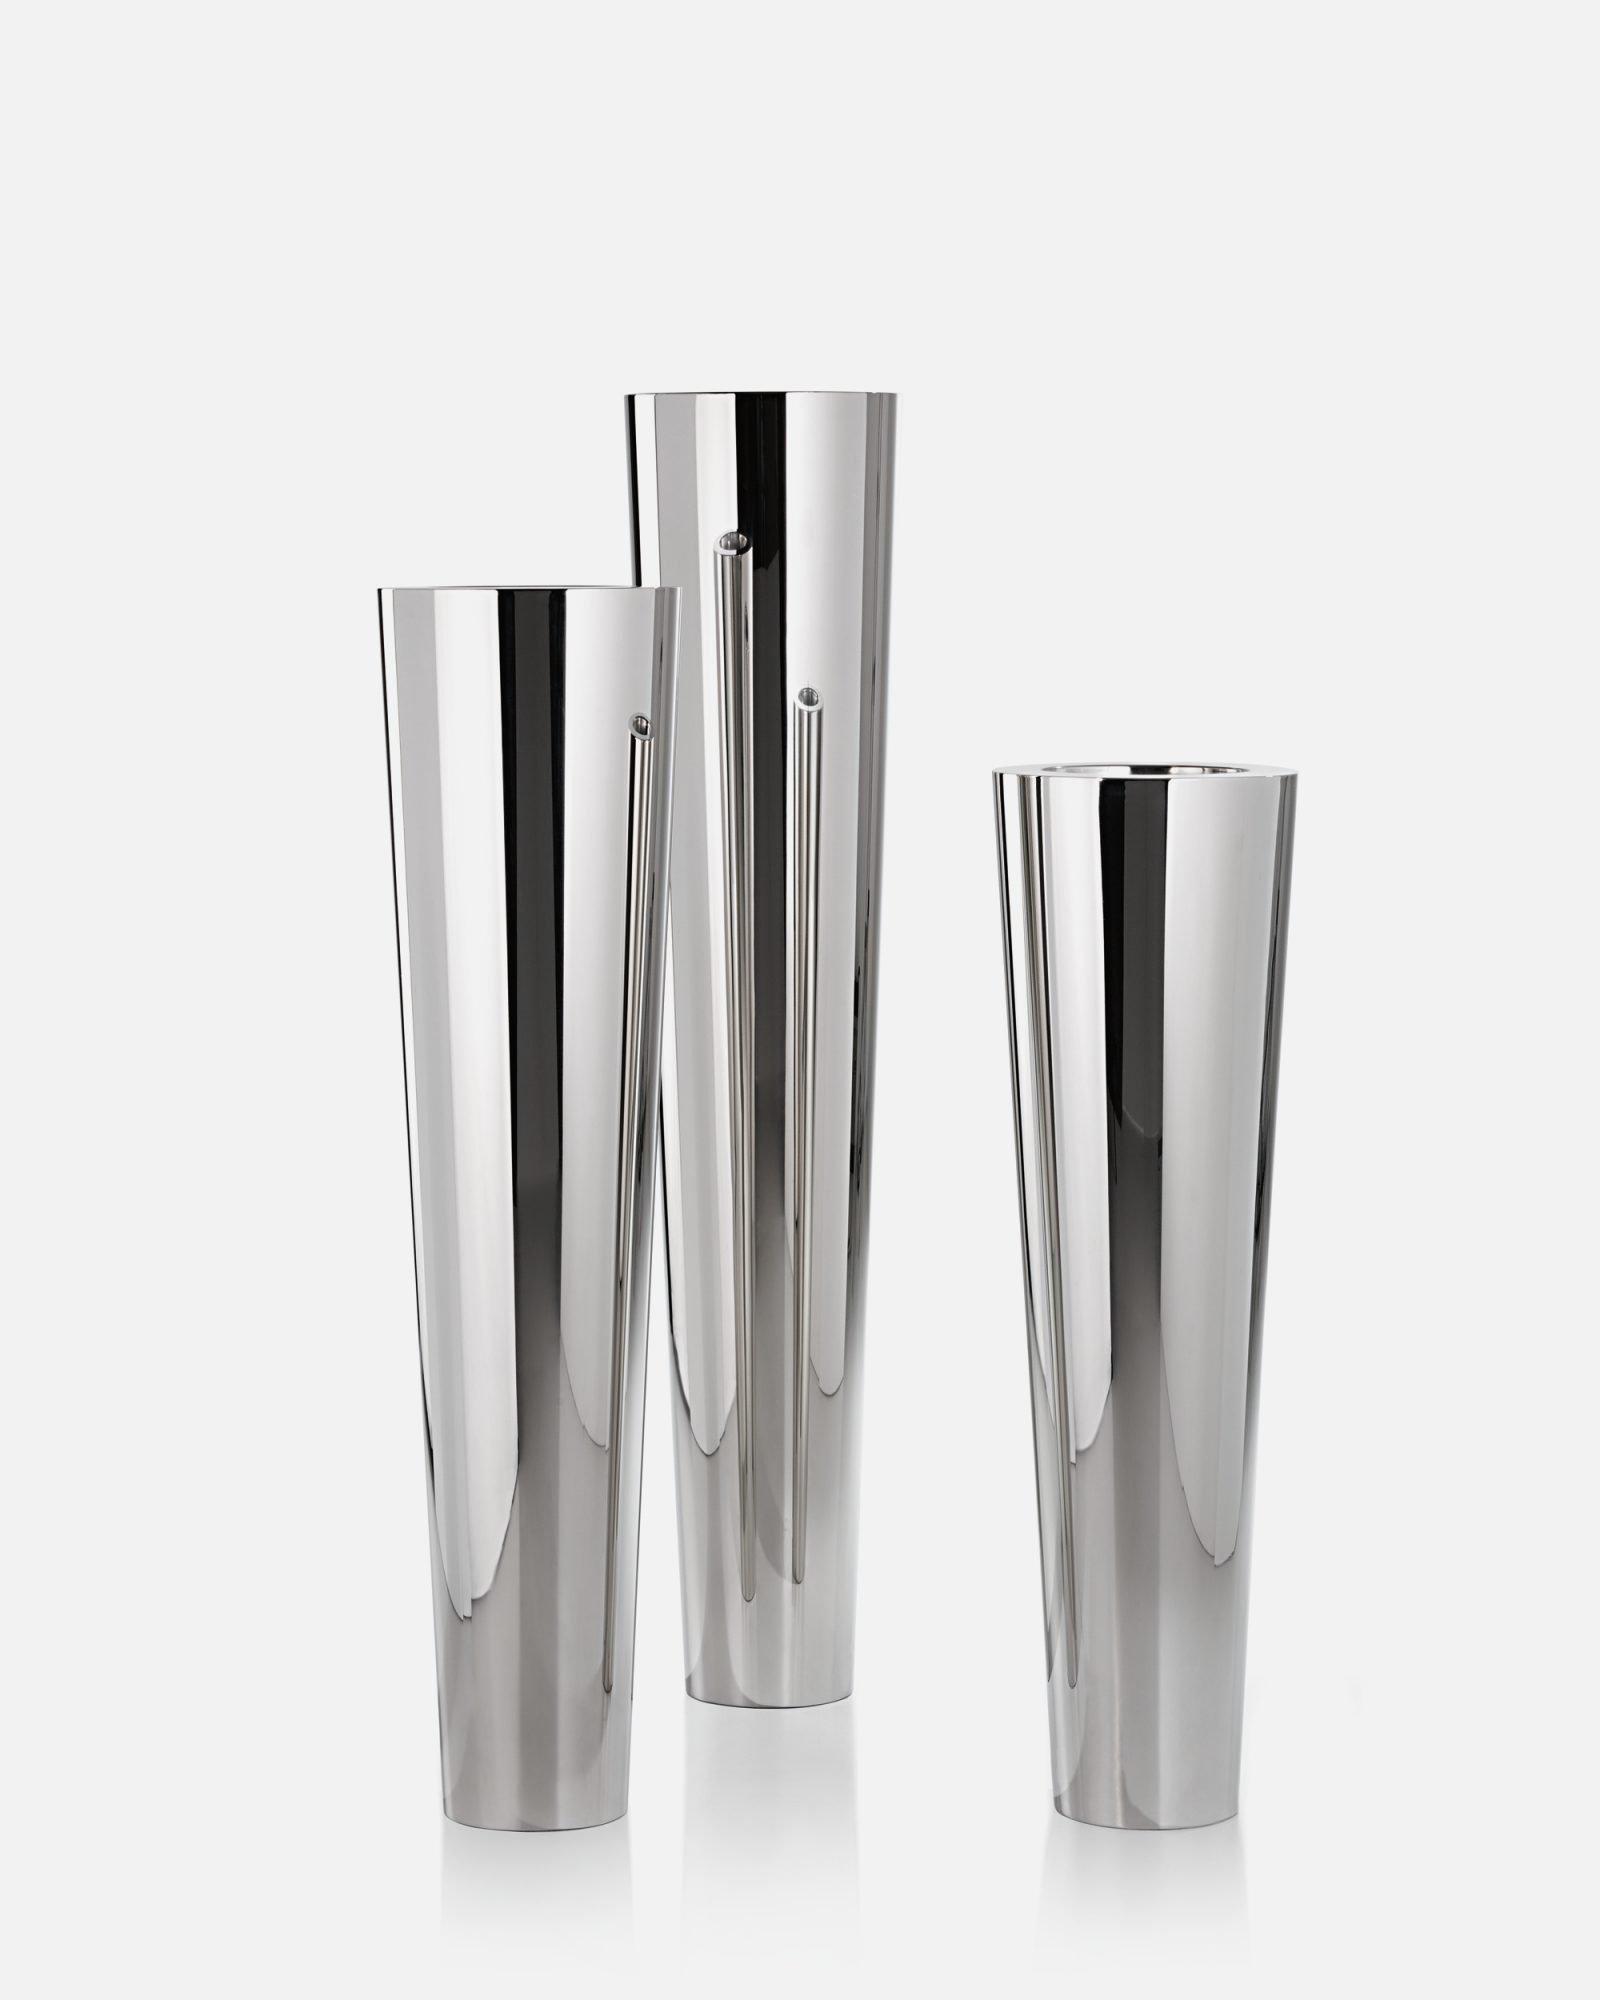 Narnya Pot  from De Castelli, designed by Albino Celato